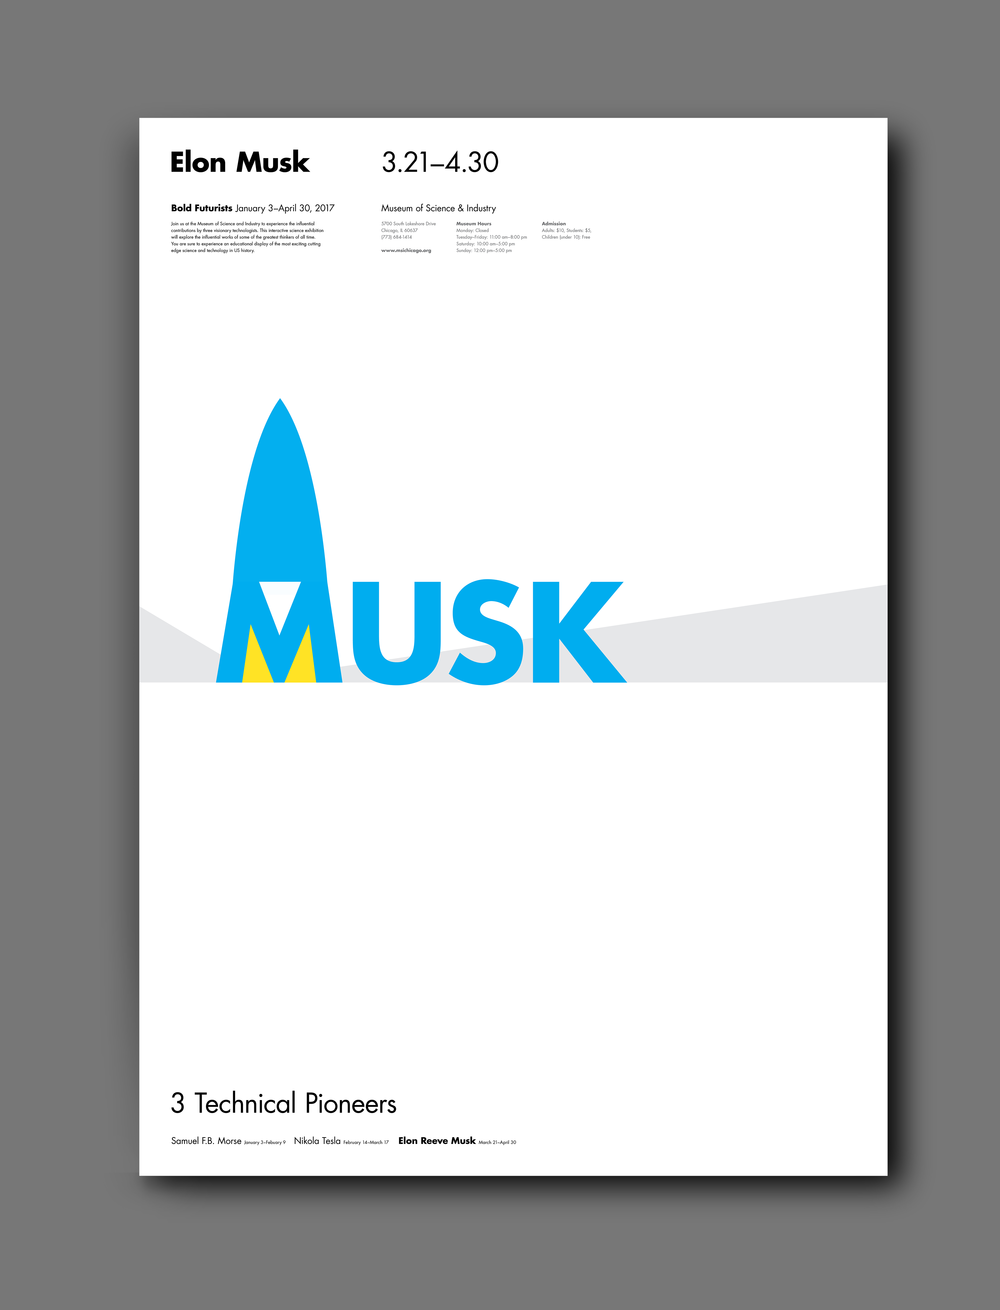 Musk_mockup.png